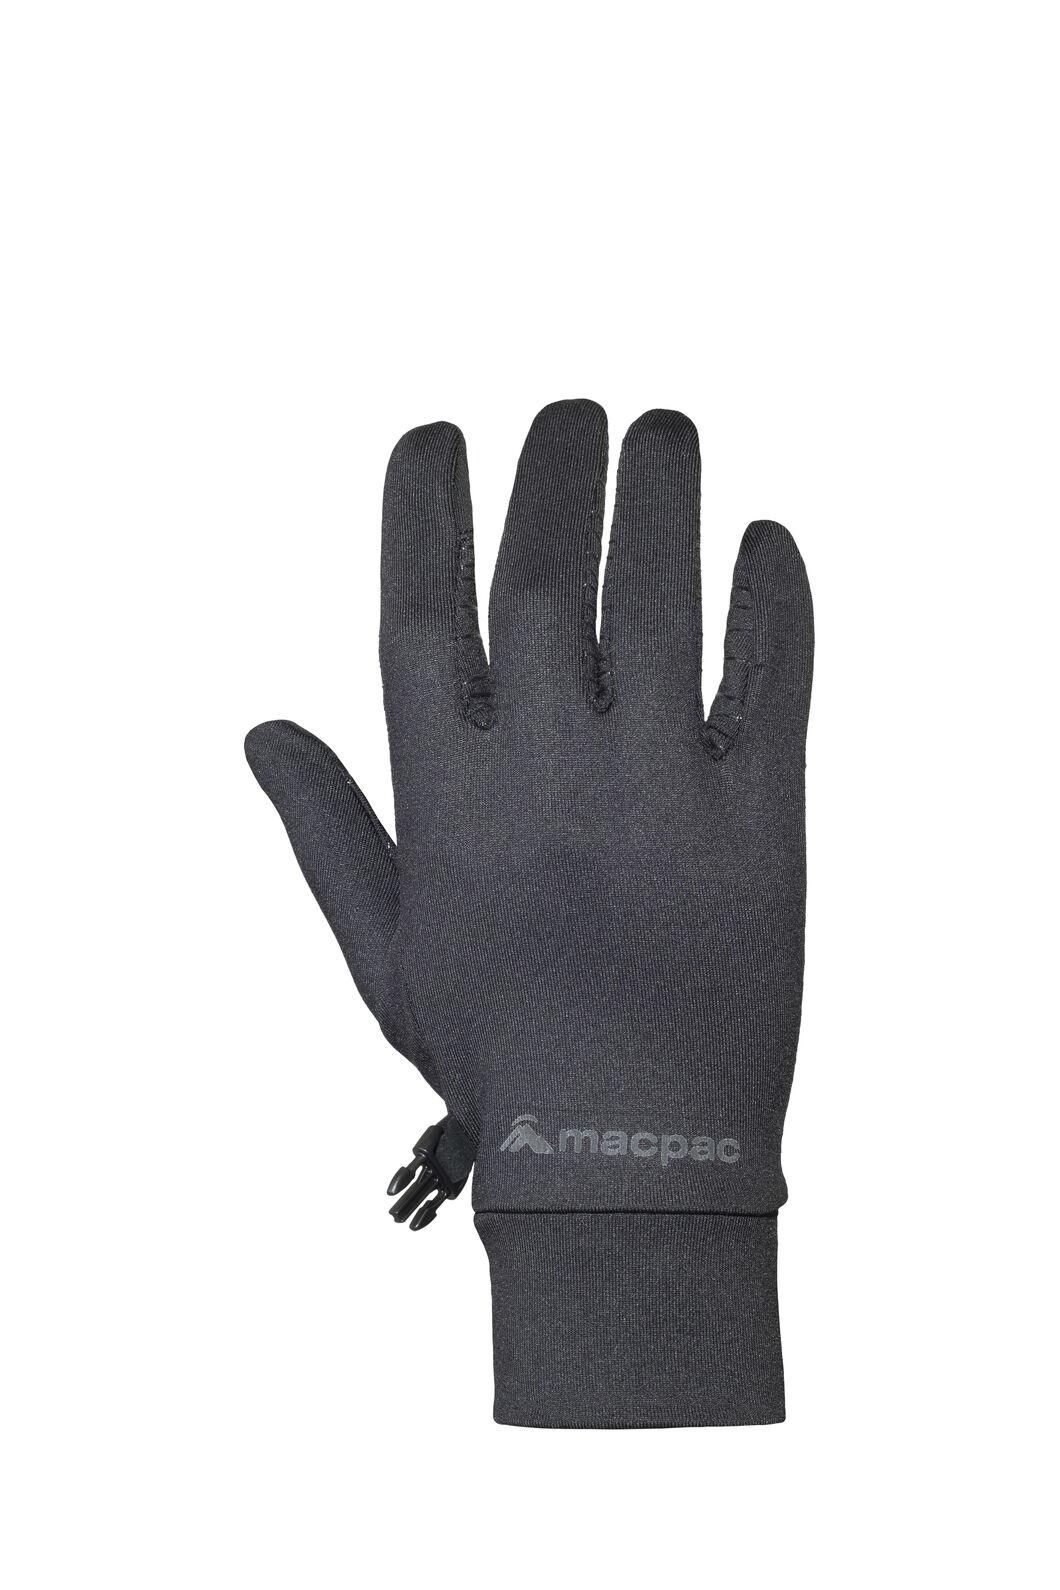 Macpac Performance Gloves, Black, hi-res